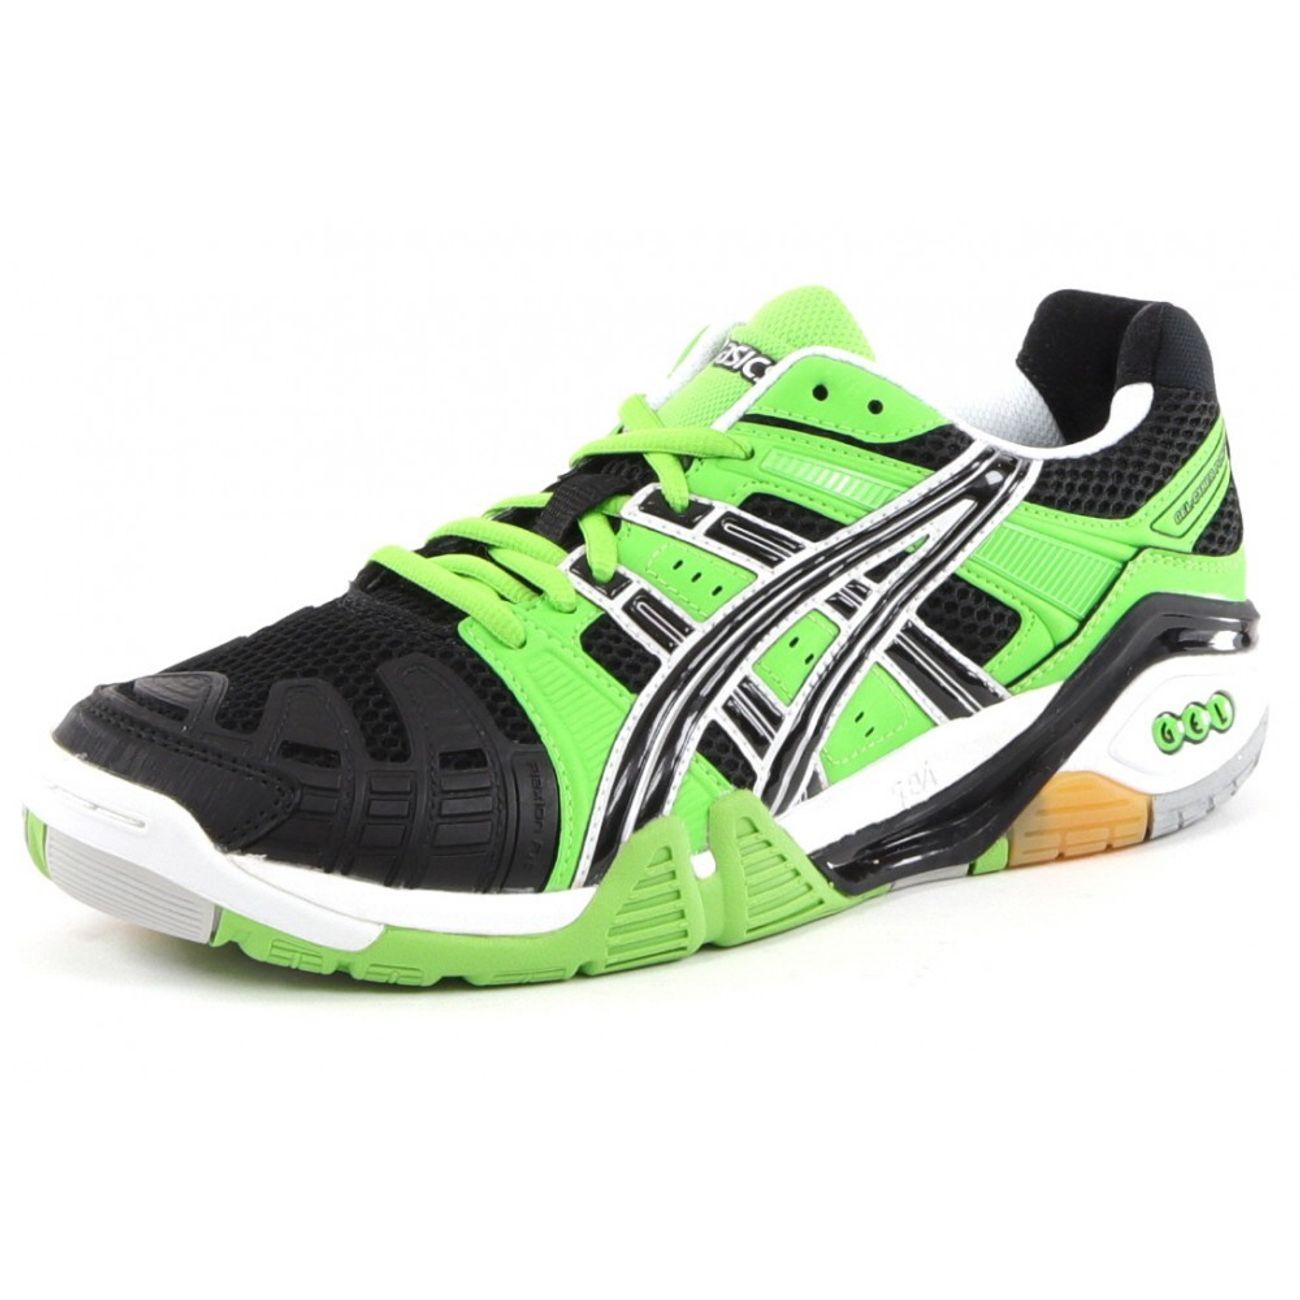 De Sport – Achat Et CherGo Cyber Chaussures Power Prix Pas Gel Running Asics y0nOP8mNvw